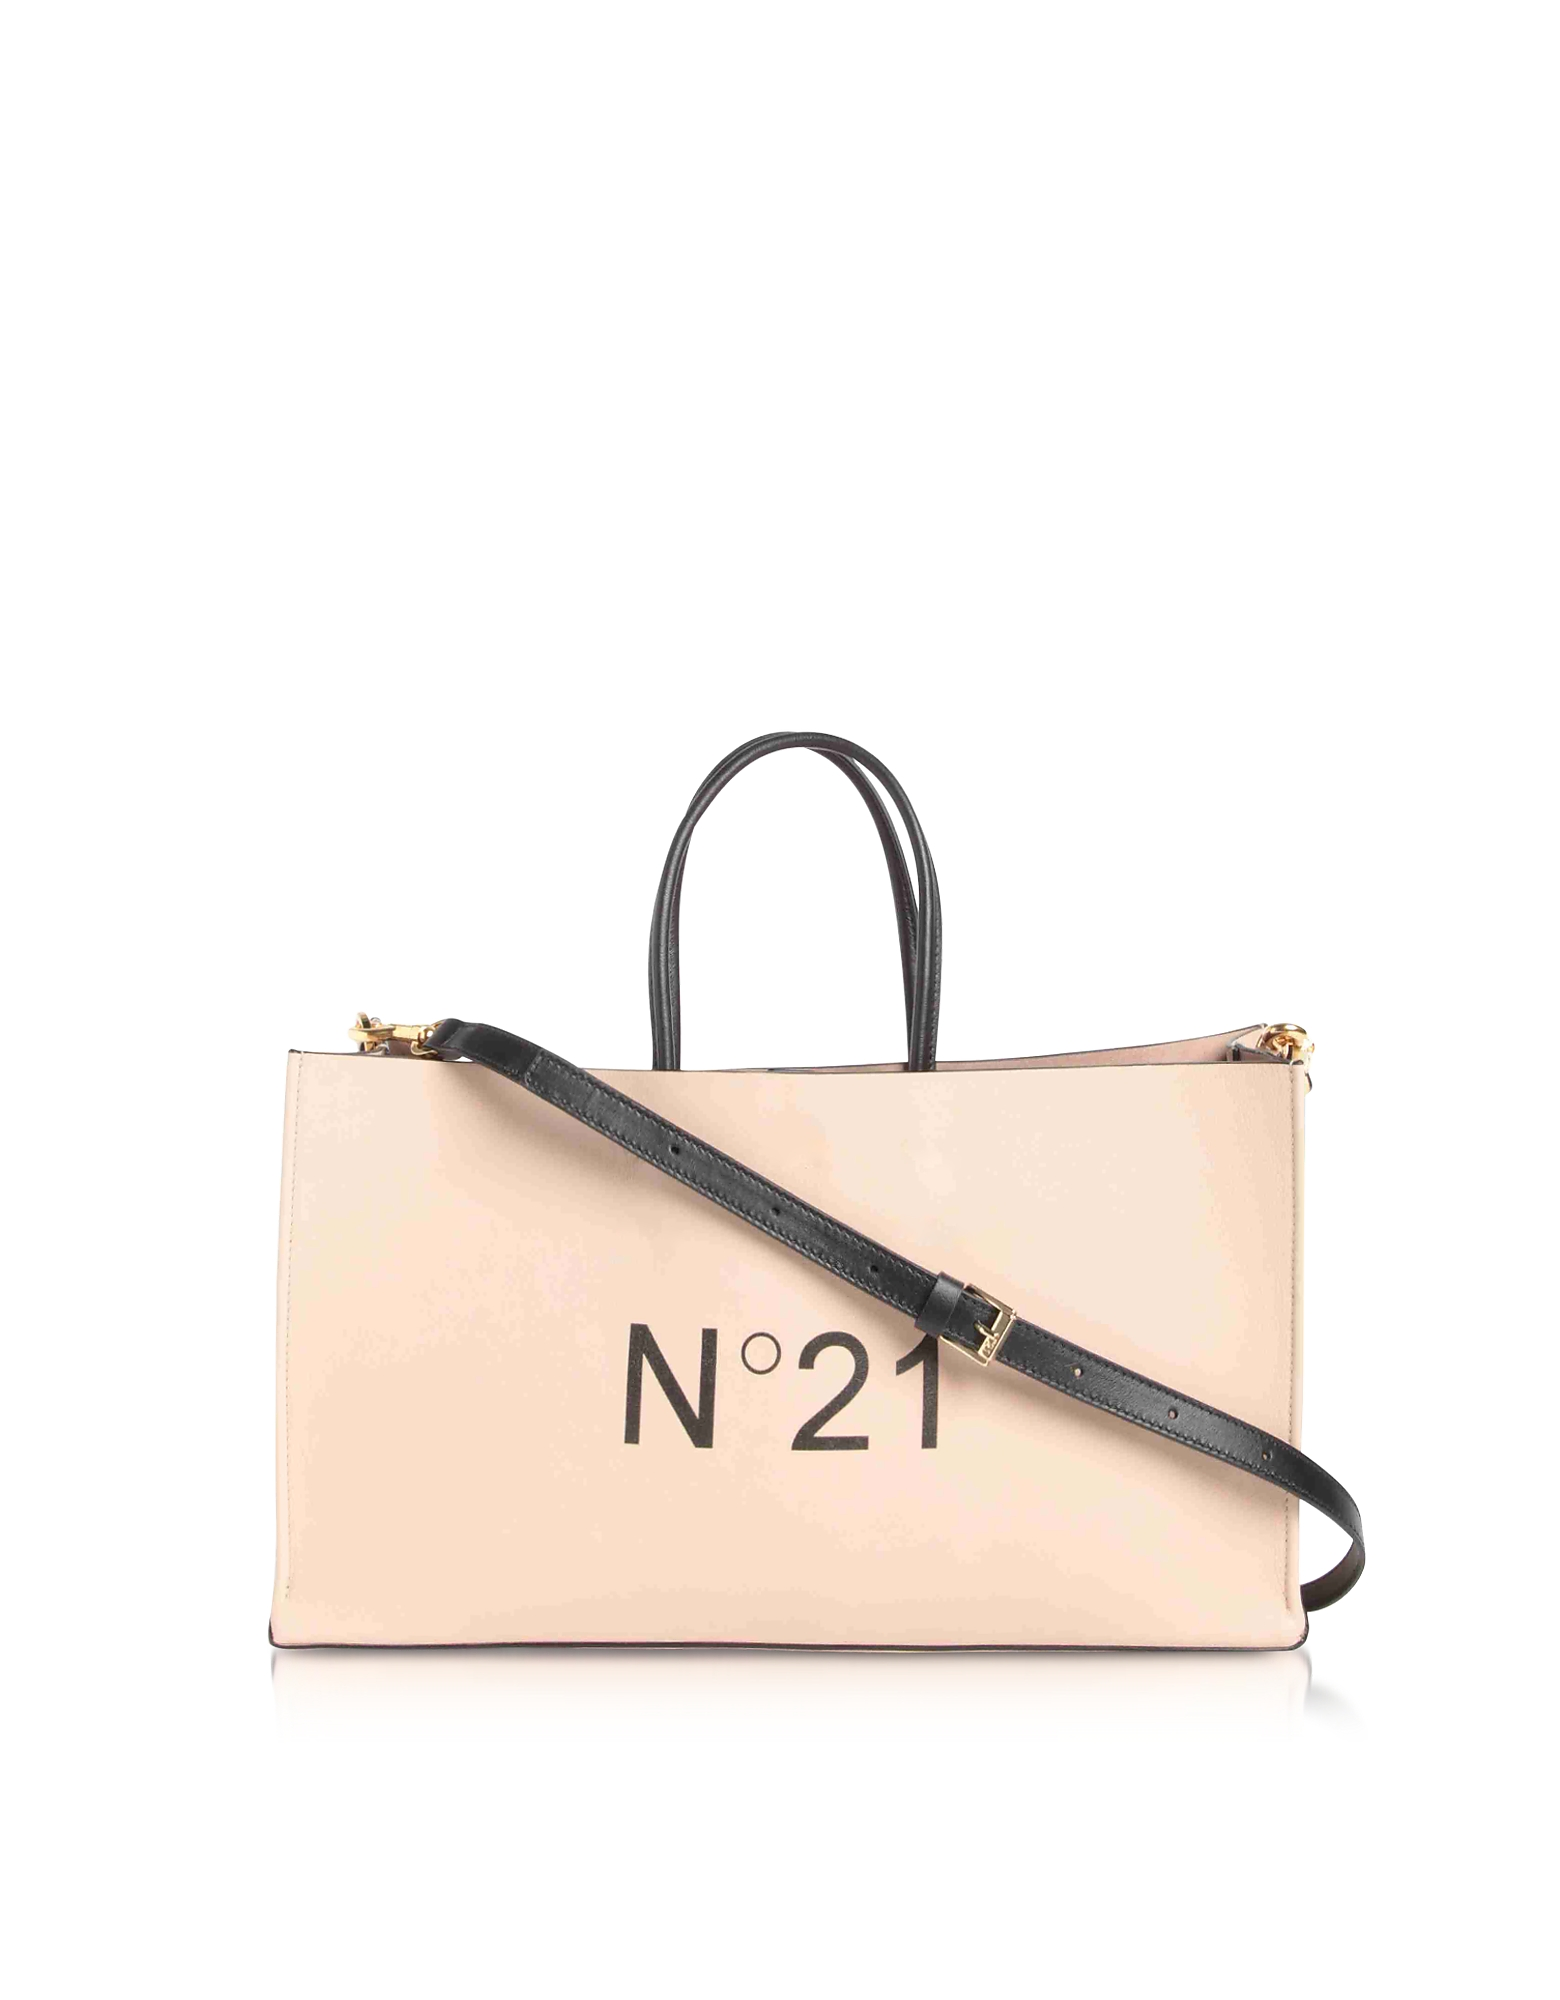 Nude Signature Tote Bag